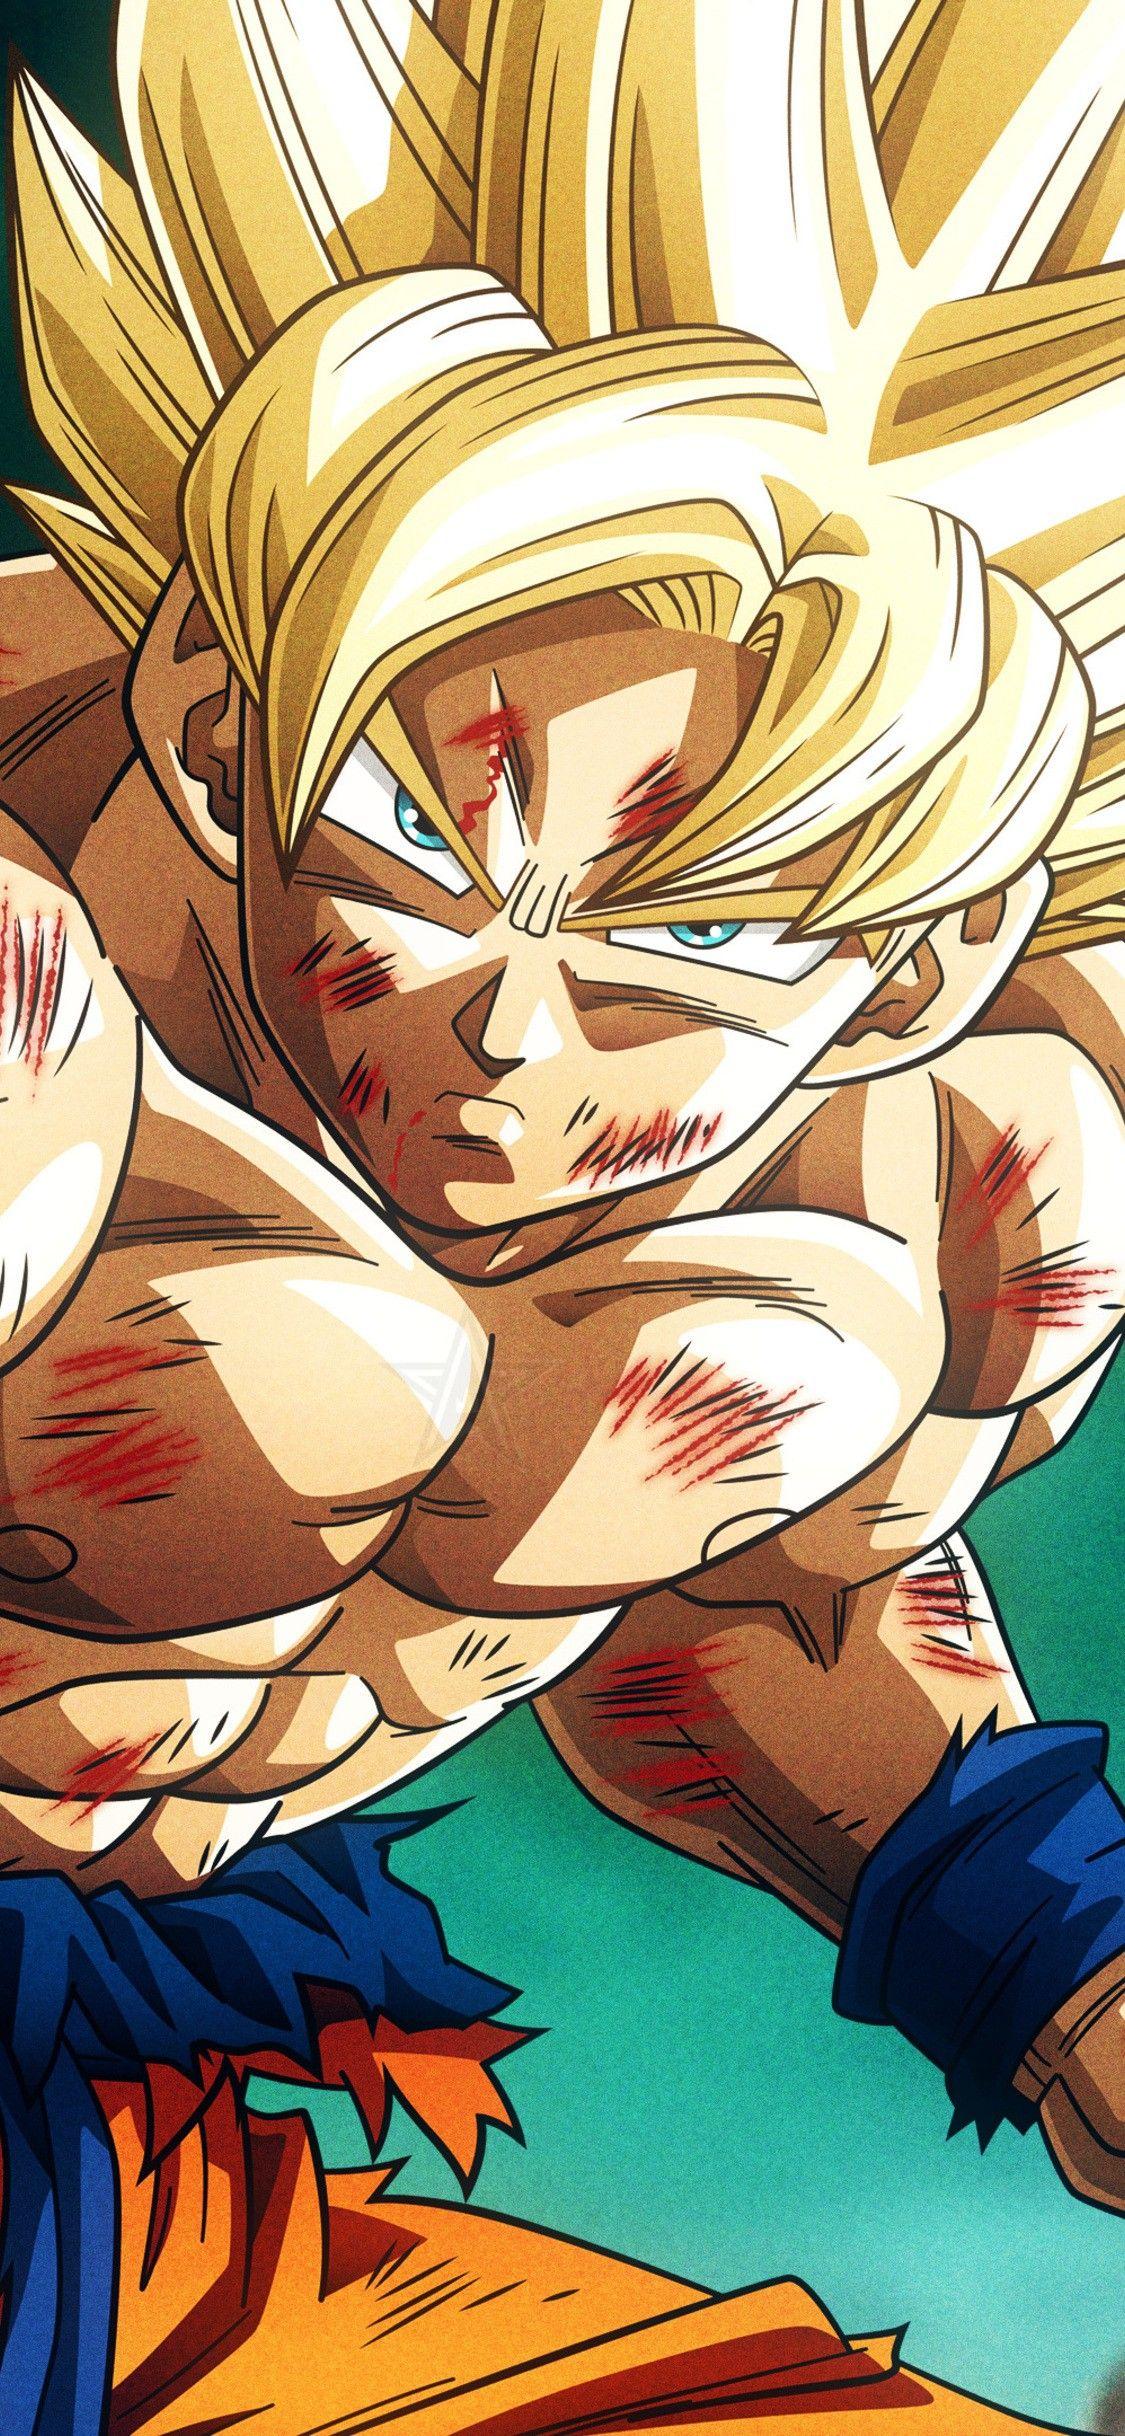 Inspirational Goku Live Wallpaper iPhone X Check more at